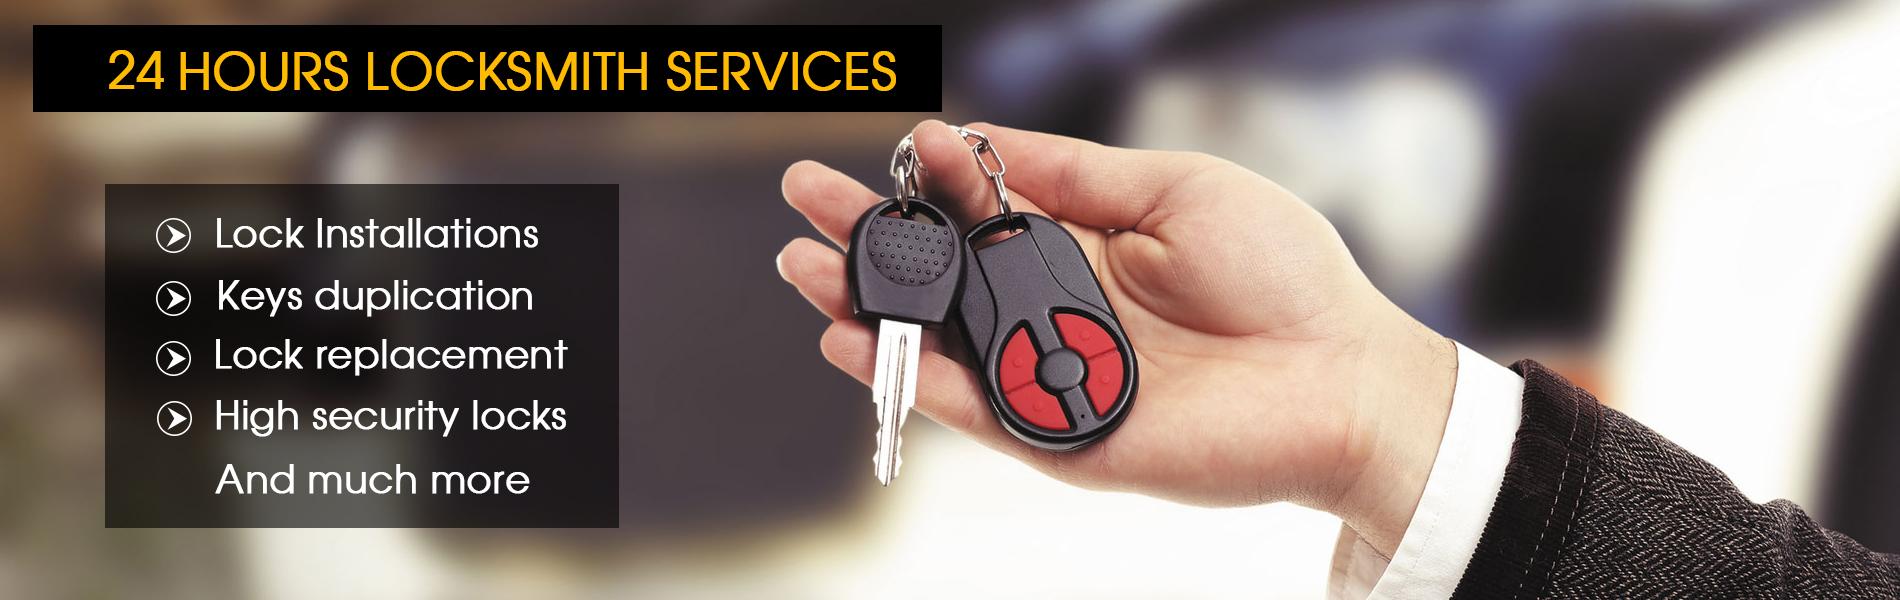 Keys locked in car automotive locksmith in phoenix arizona -  Phoenix Expert Locksmith Phoenix Az 623 850 5368